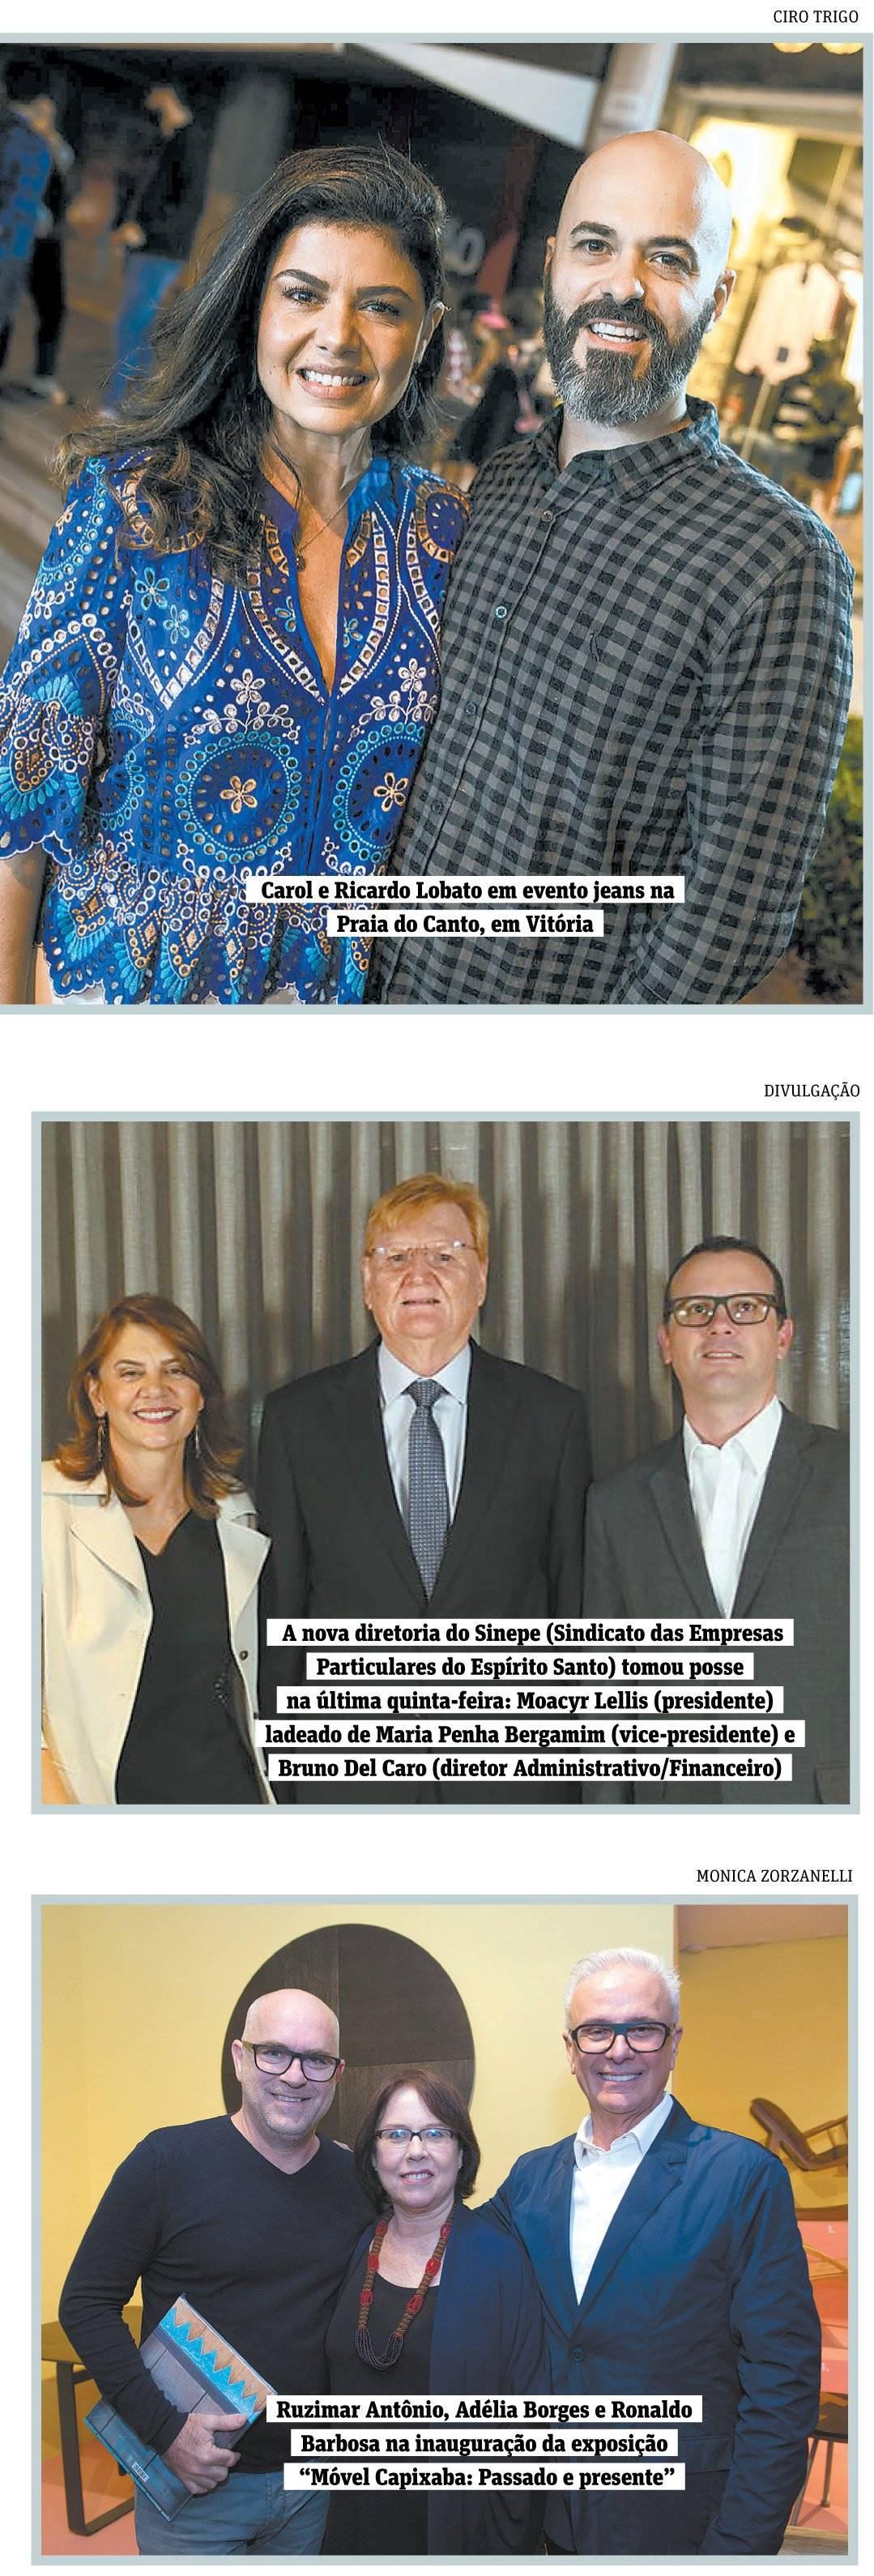 Coluna Viviane Anselmé 17 de julho de 2018